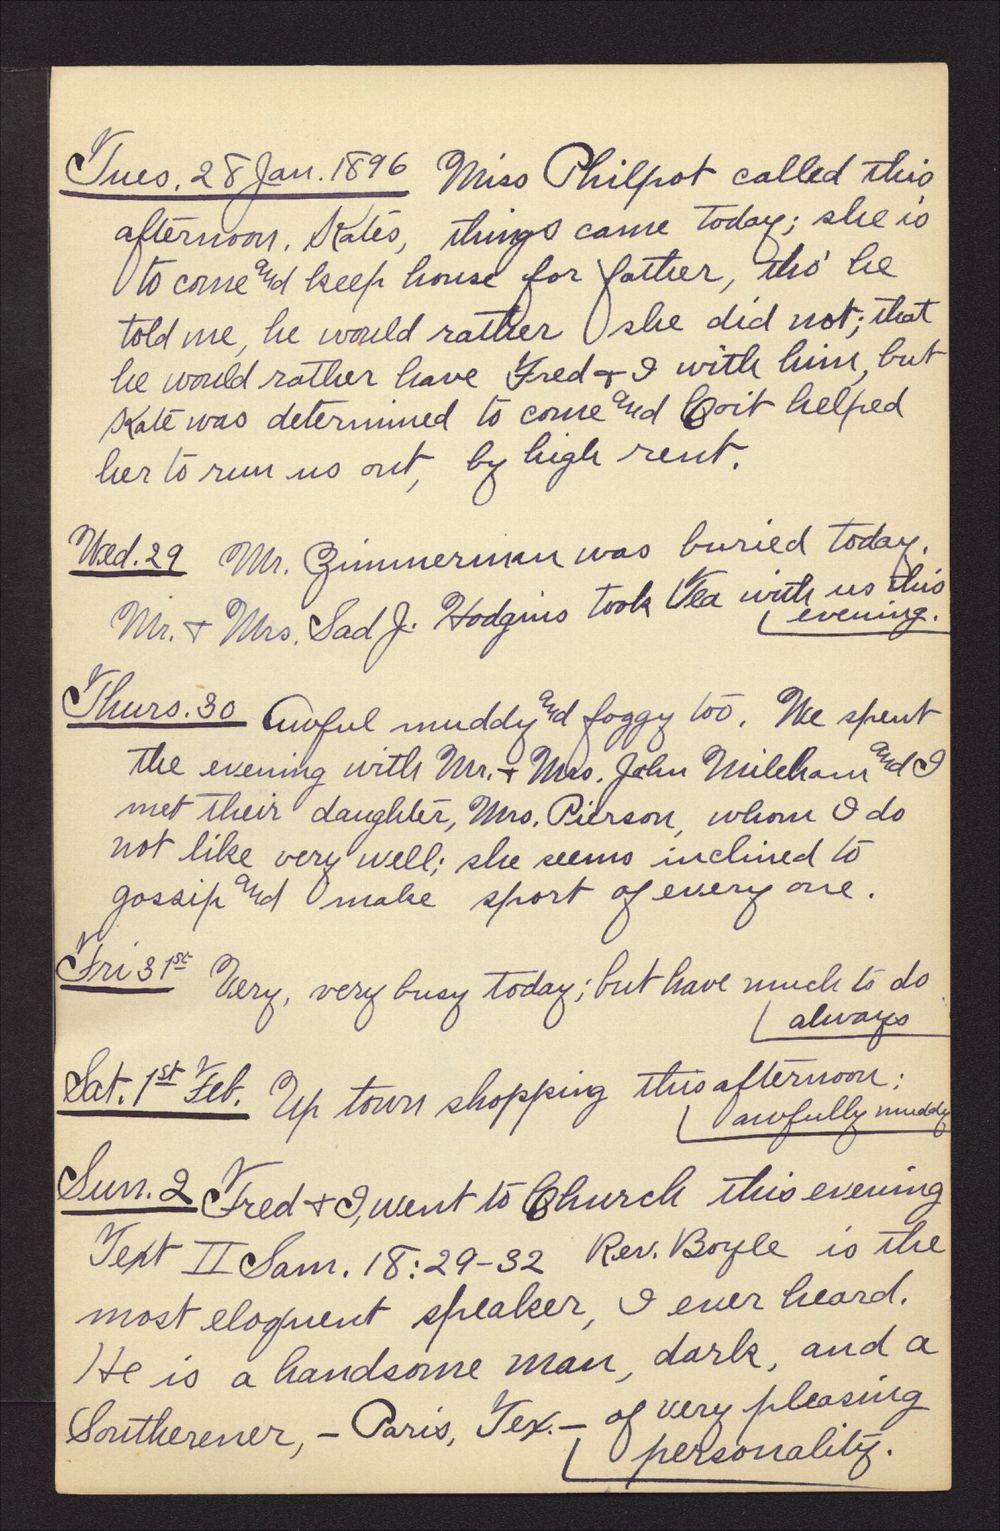 Martha Farnsworth diary - Jan 28, 1896